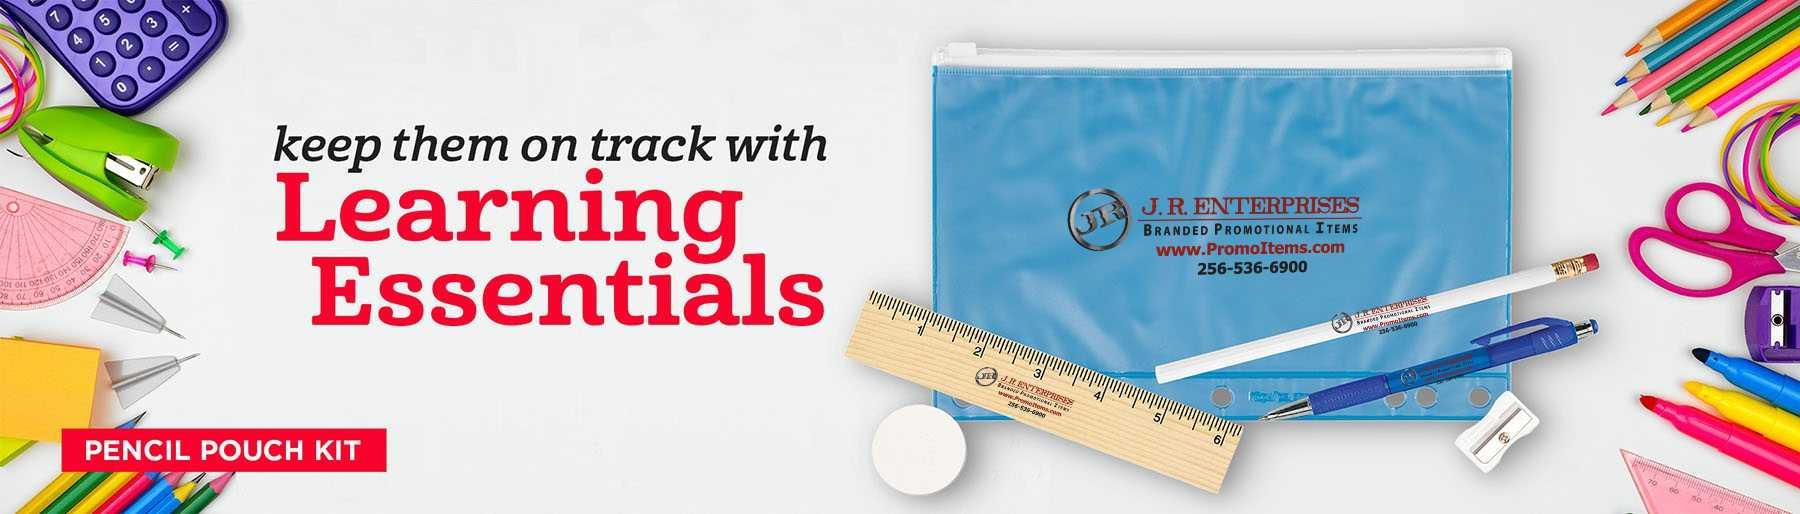 Pencil Pouch Kit AIM